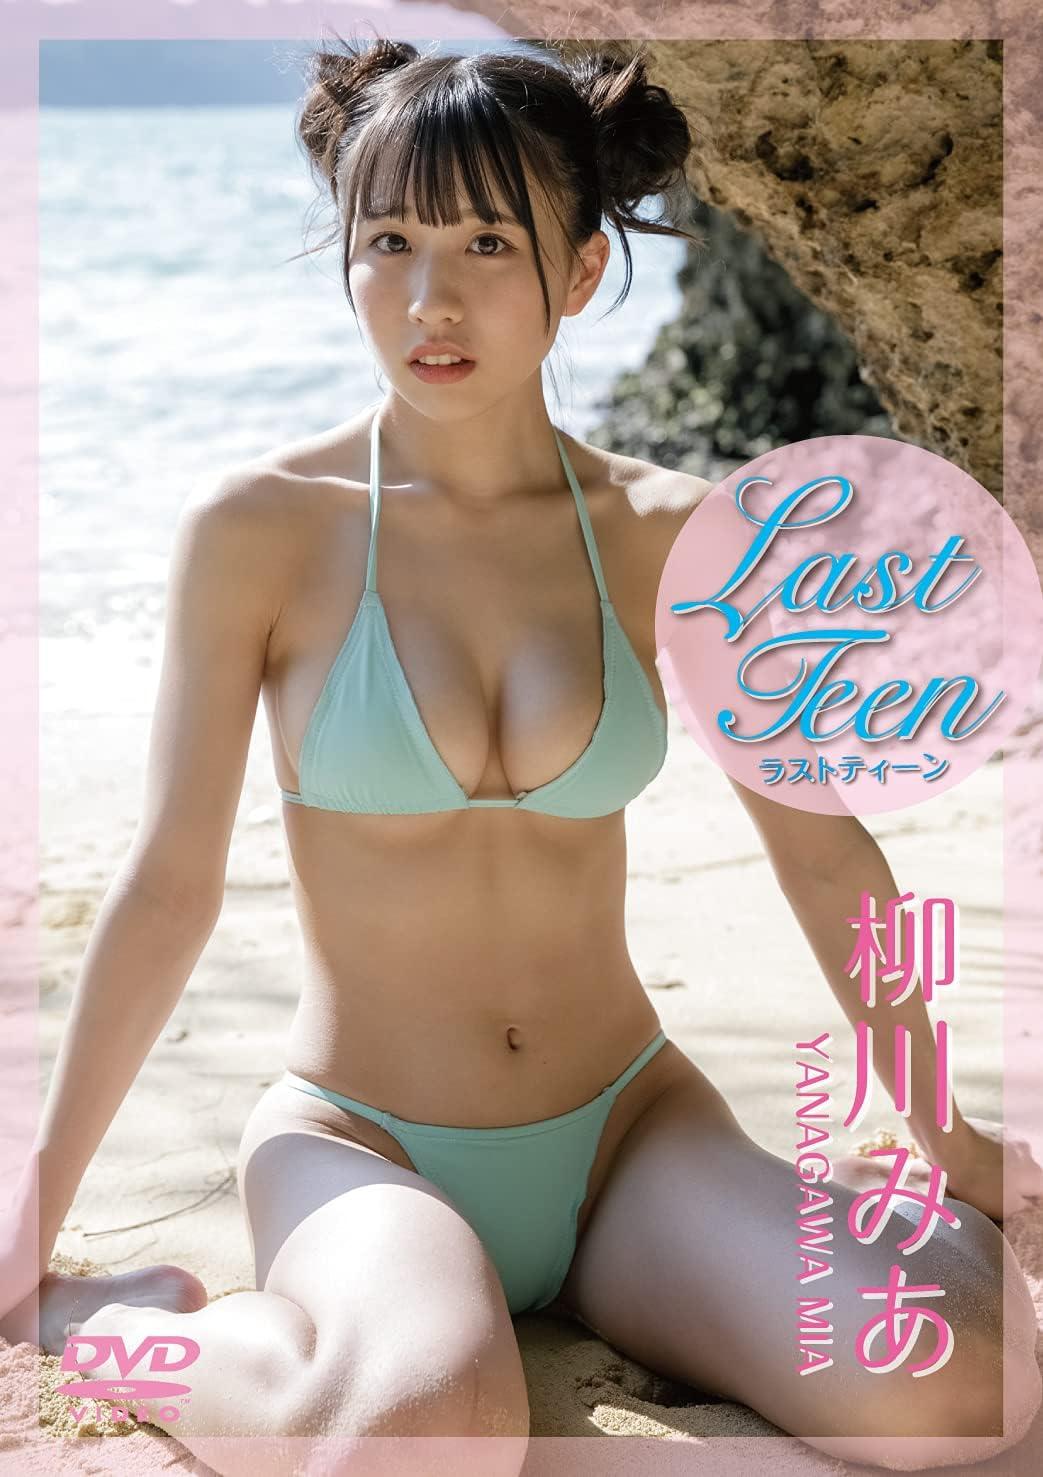 Fカップグラドル 柳川みあ Yanagawa Mia さん 動画と画像の作品リスト